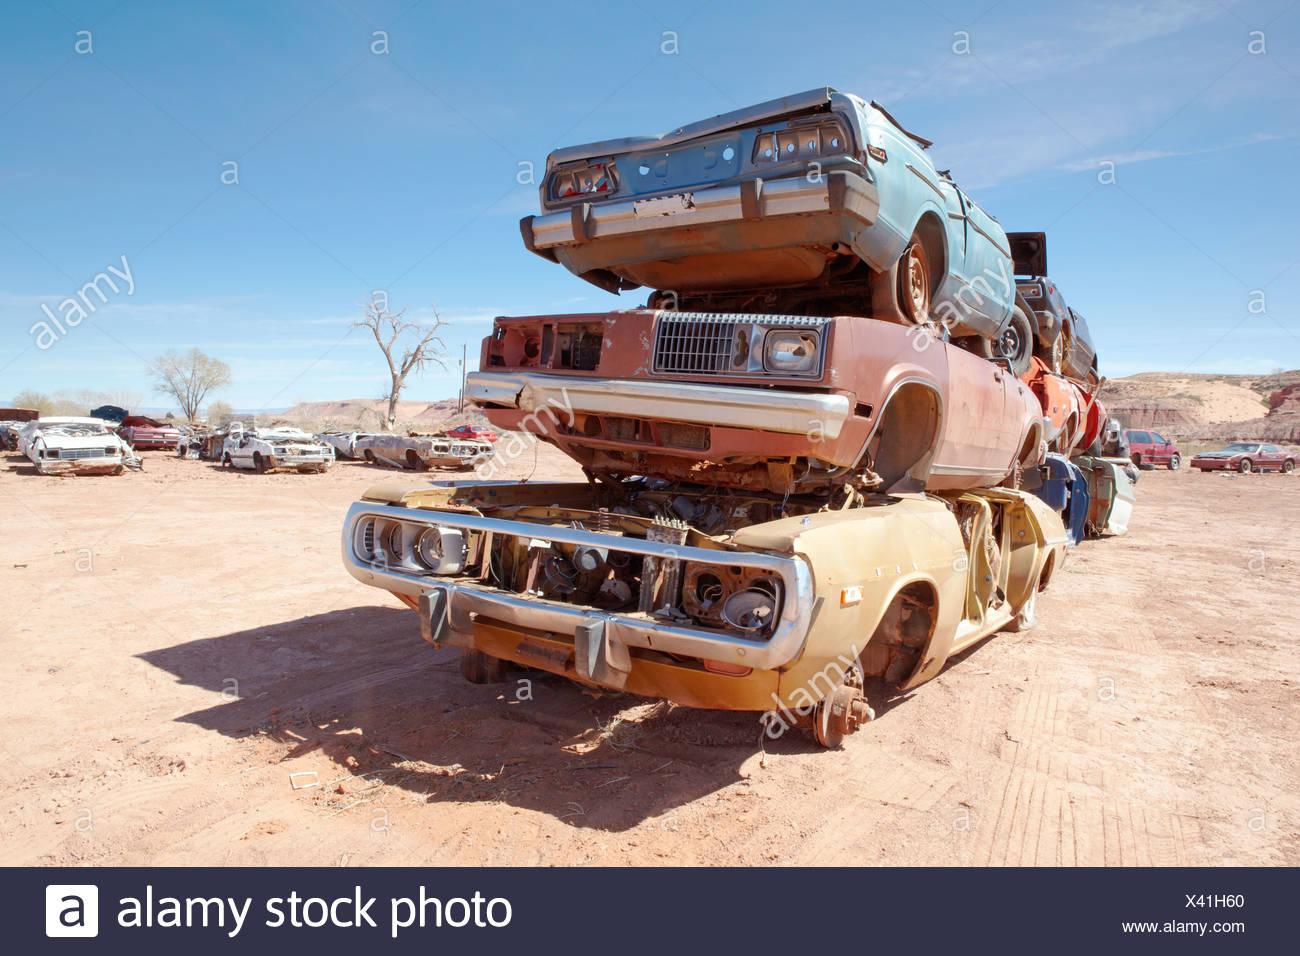 Pile of scrap cars Stock Photo: 277859960 - Alamy